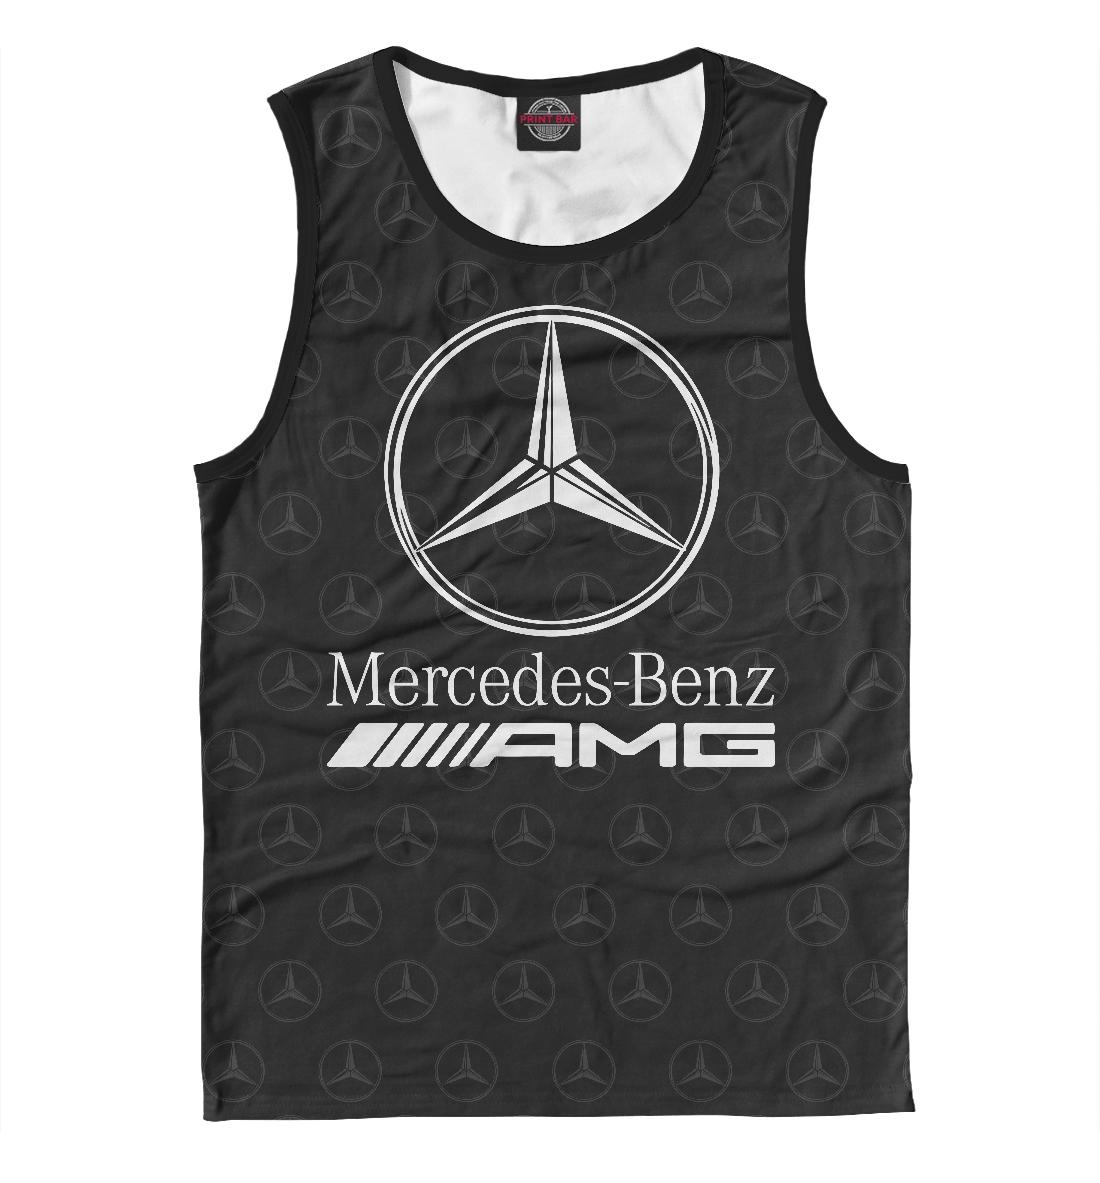 Купить Mercedes-Benz AMG Premium, Printbar, Майки, MER-425413-may-2